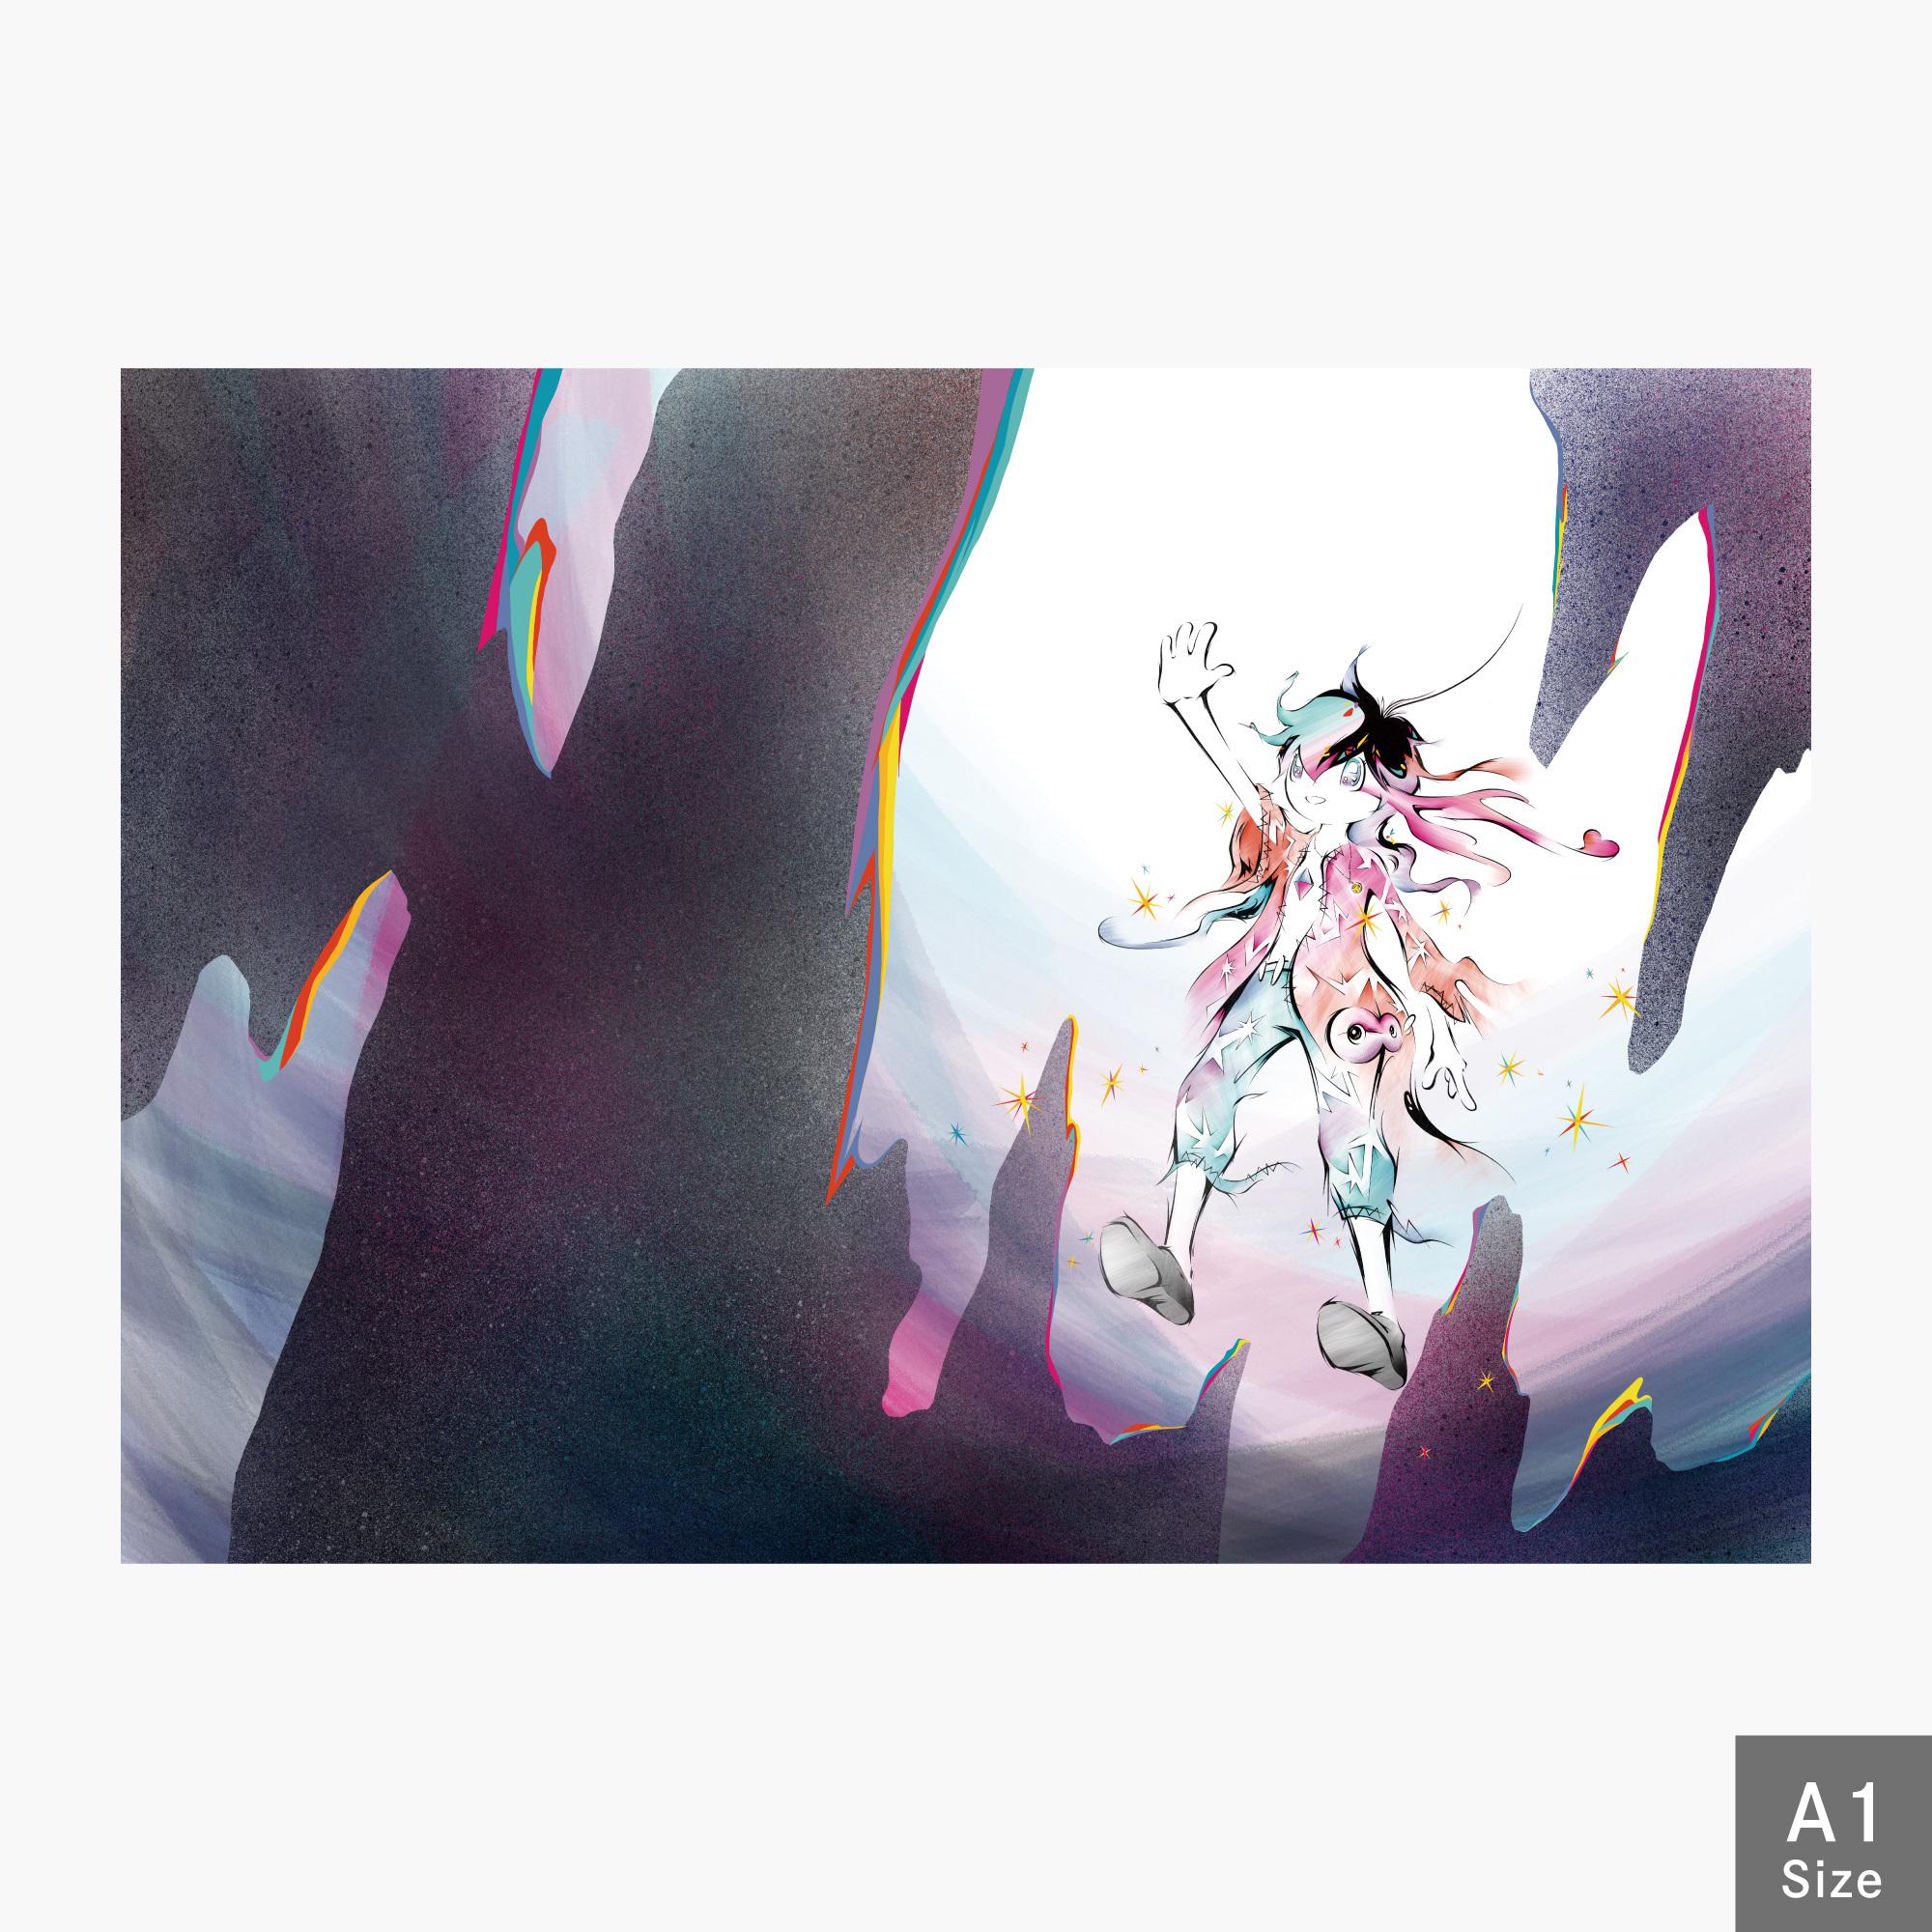 【A1 ジークレー版画】 壁は幻。溶かしてしまえ 【受注生産】